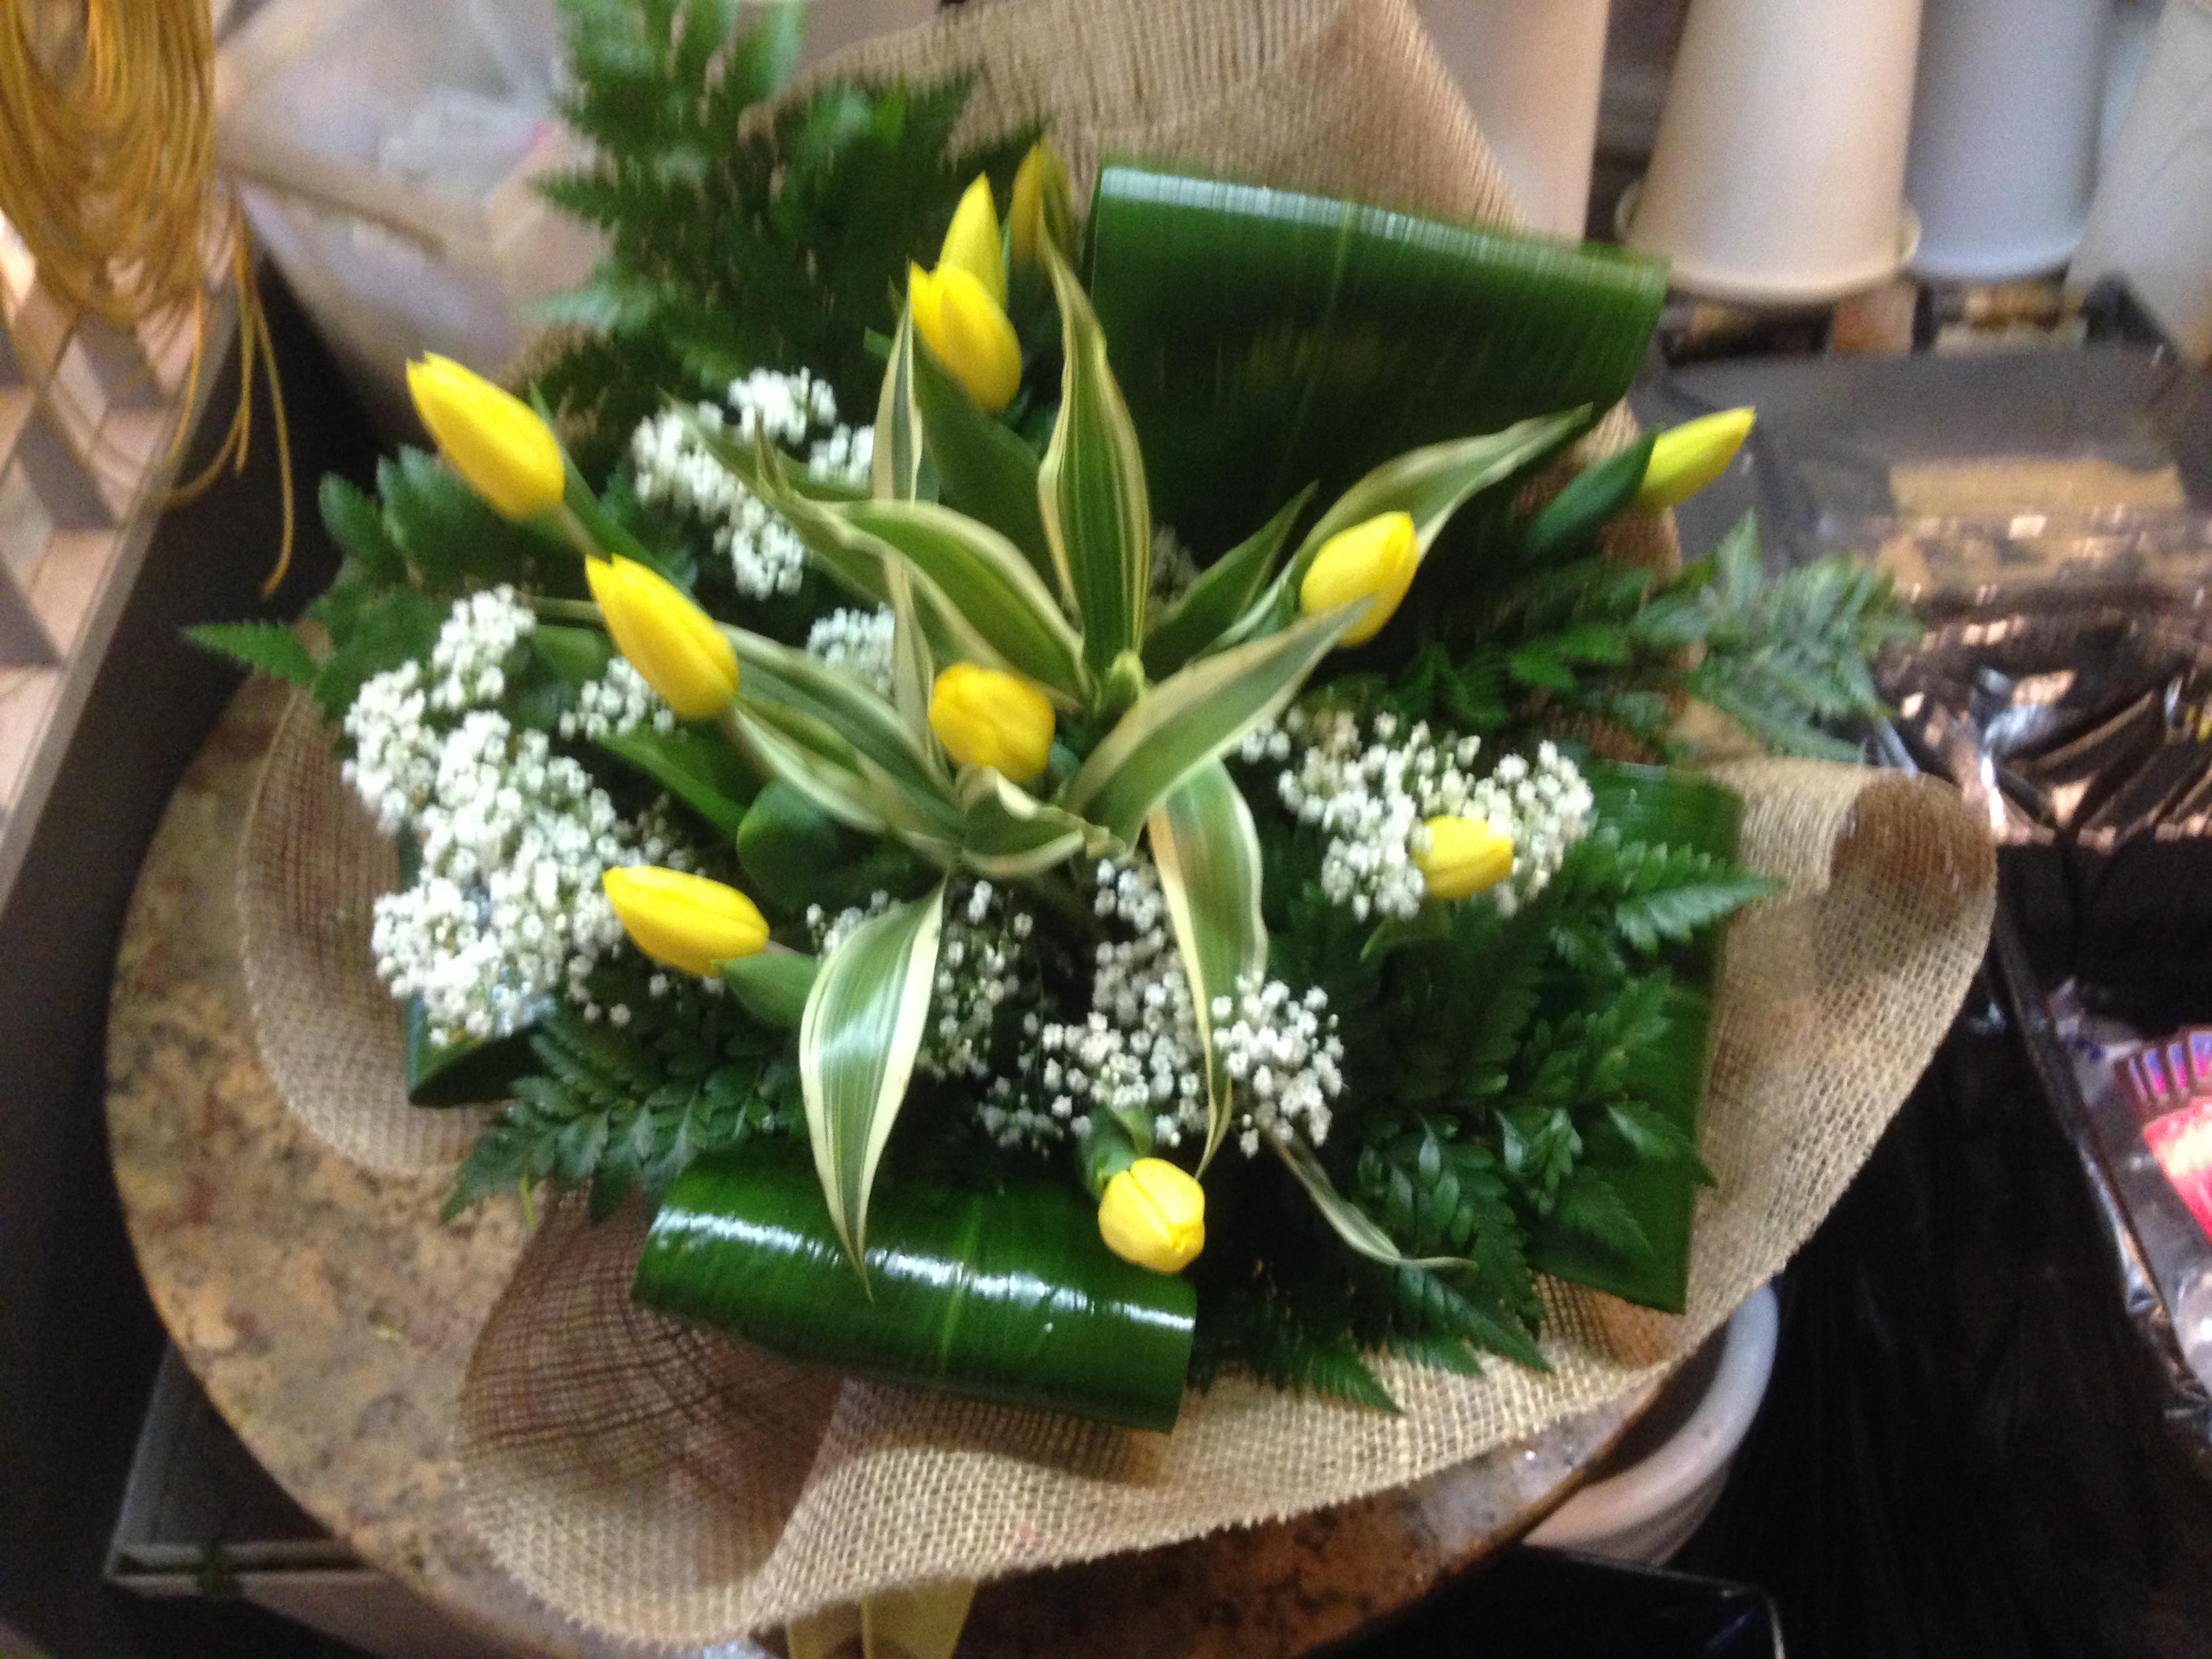 Fiori di cerimonia nuziale tulipani immagini for Tulipani arancioni